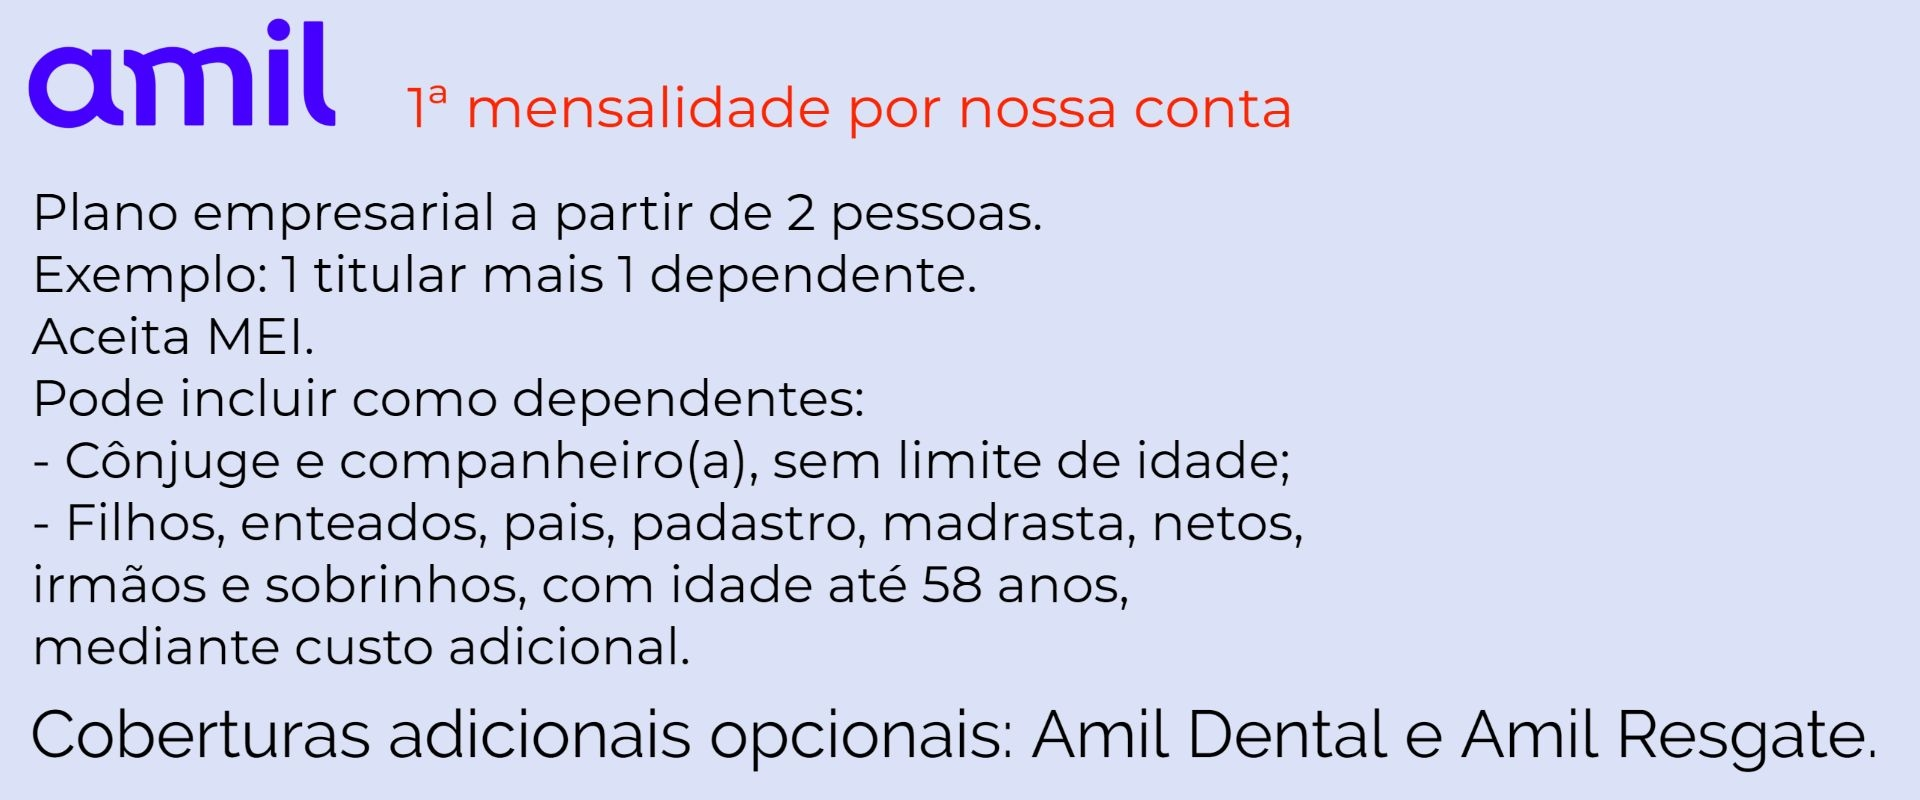 Amil Empresarial Salvador-BA